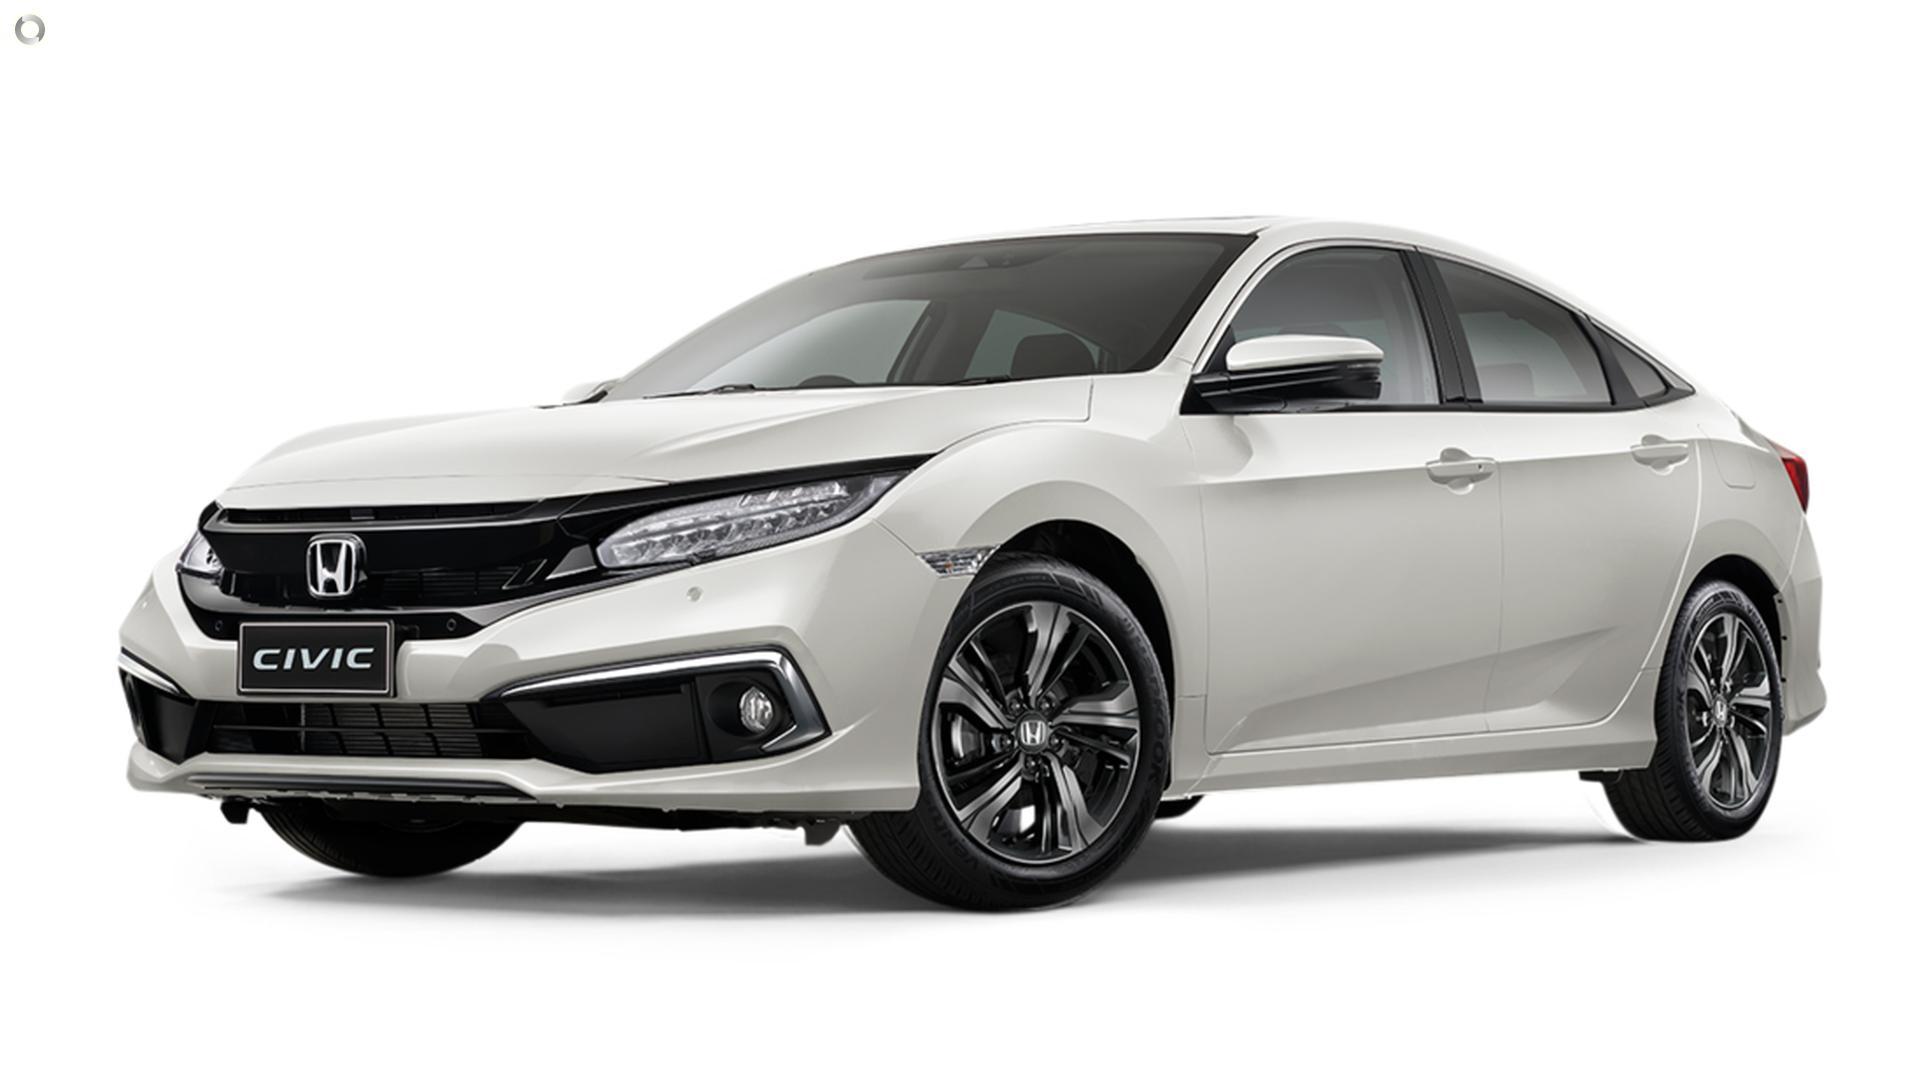 2020 Honda Civic 10th Gen